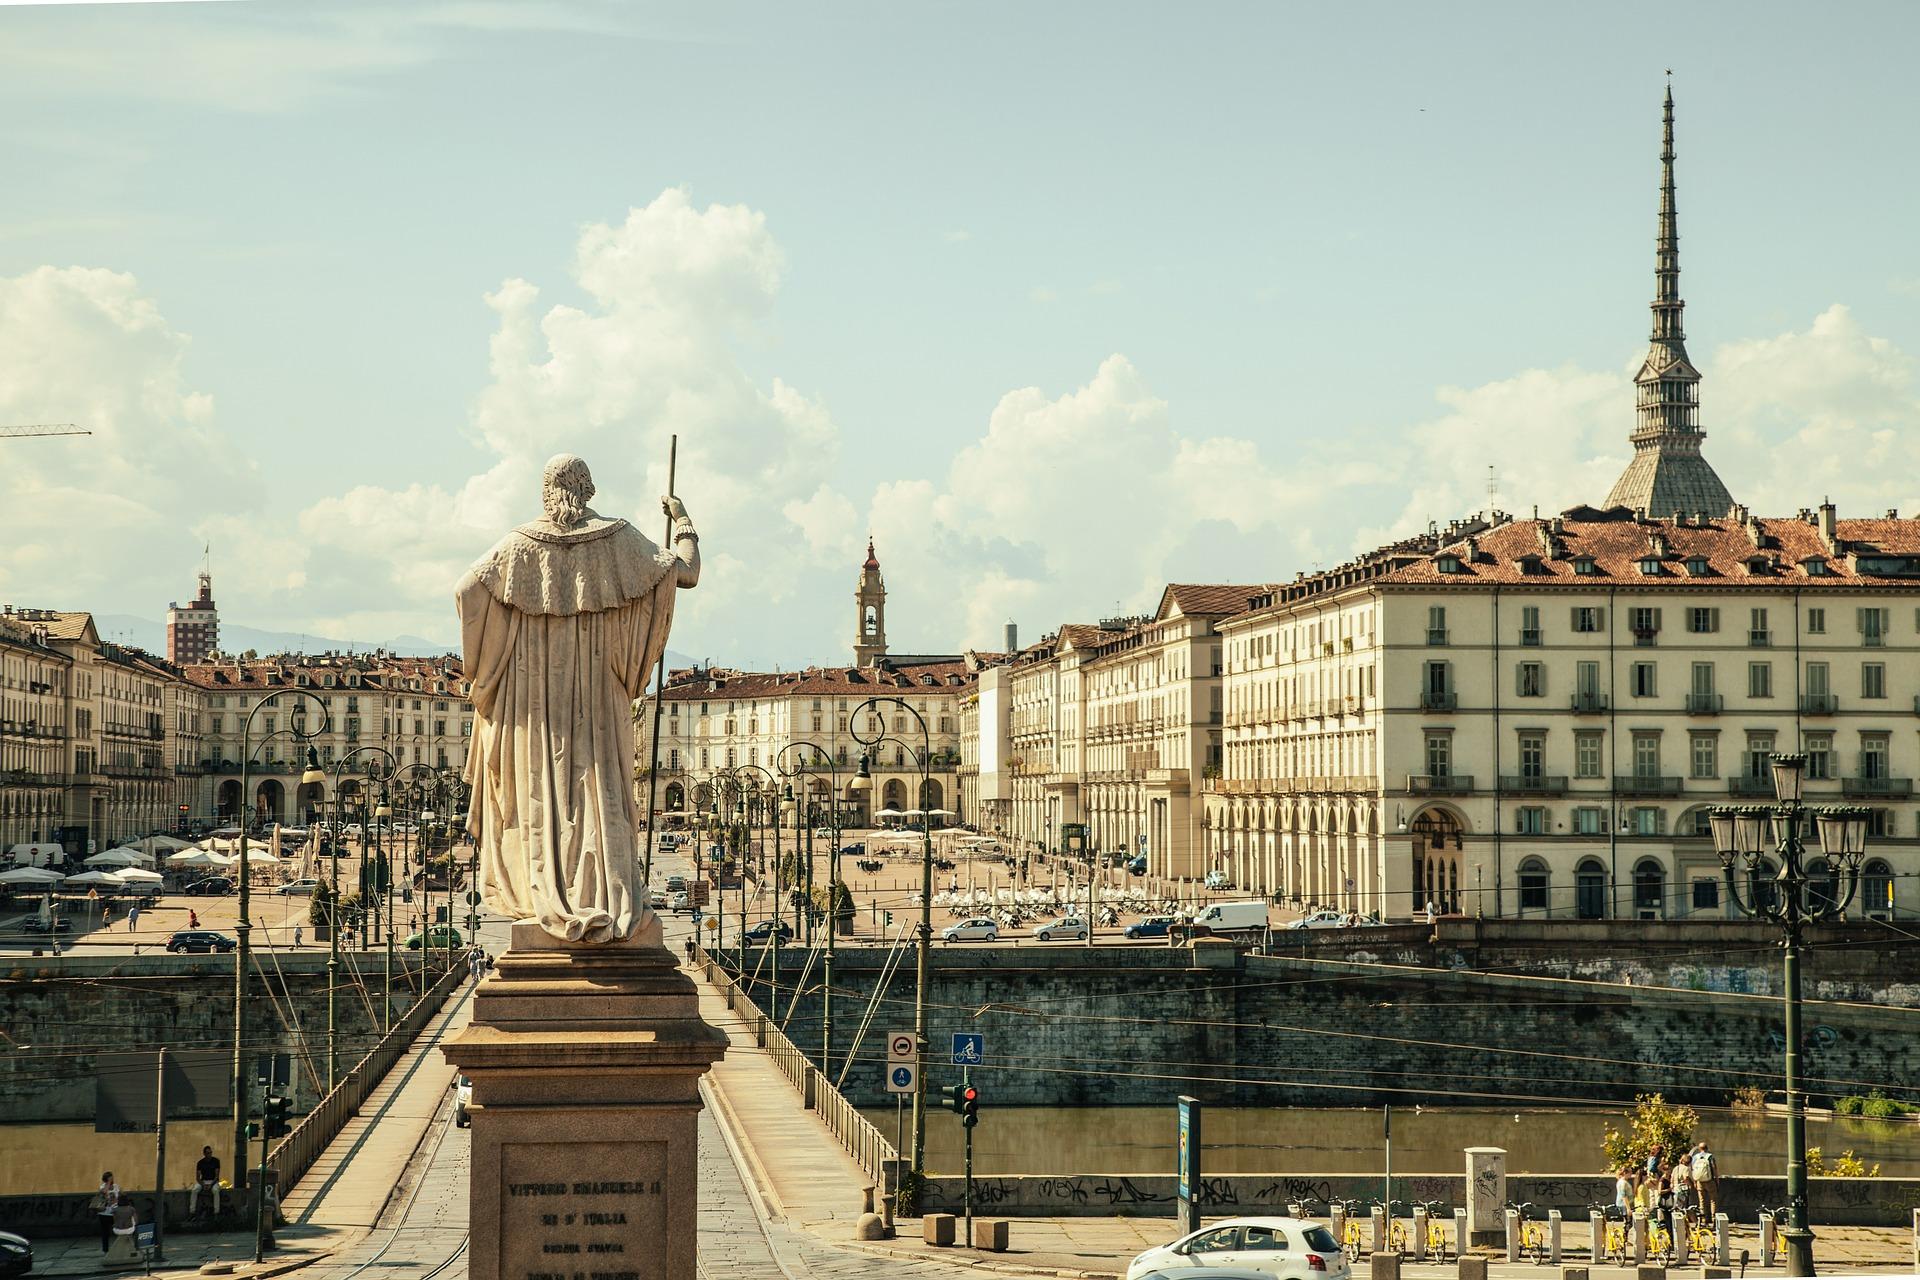 kulinariske oplevelser i Torino